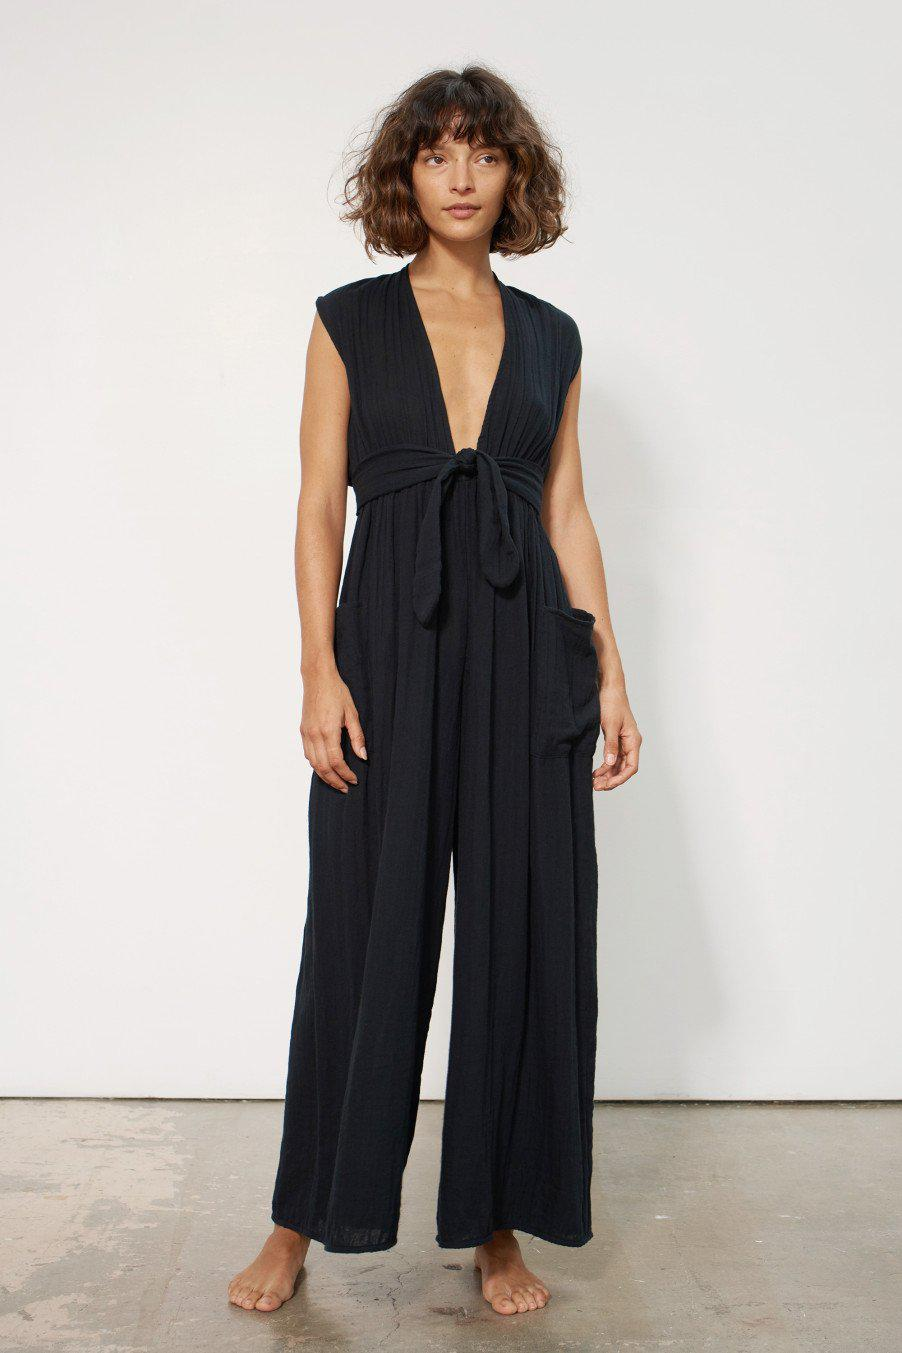 b7d2f9d359b Lyst - Mara Hoffman Whitney Jumpsuit In Black in Black